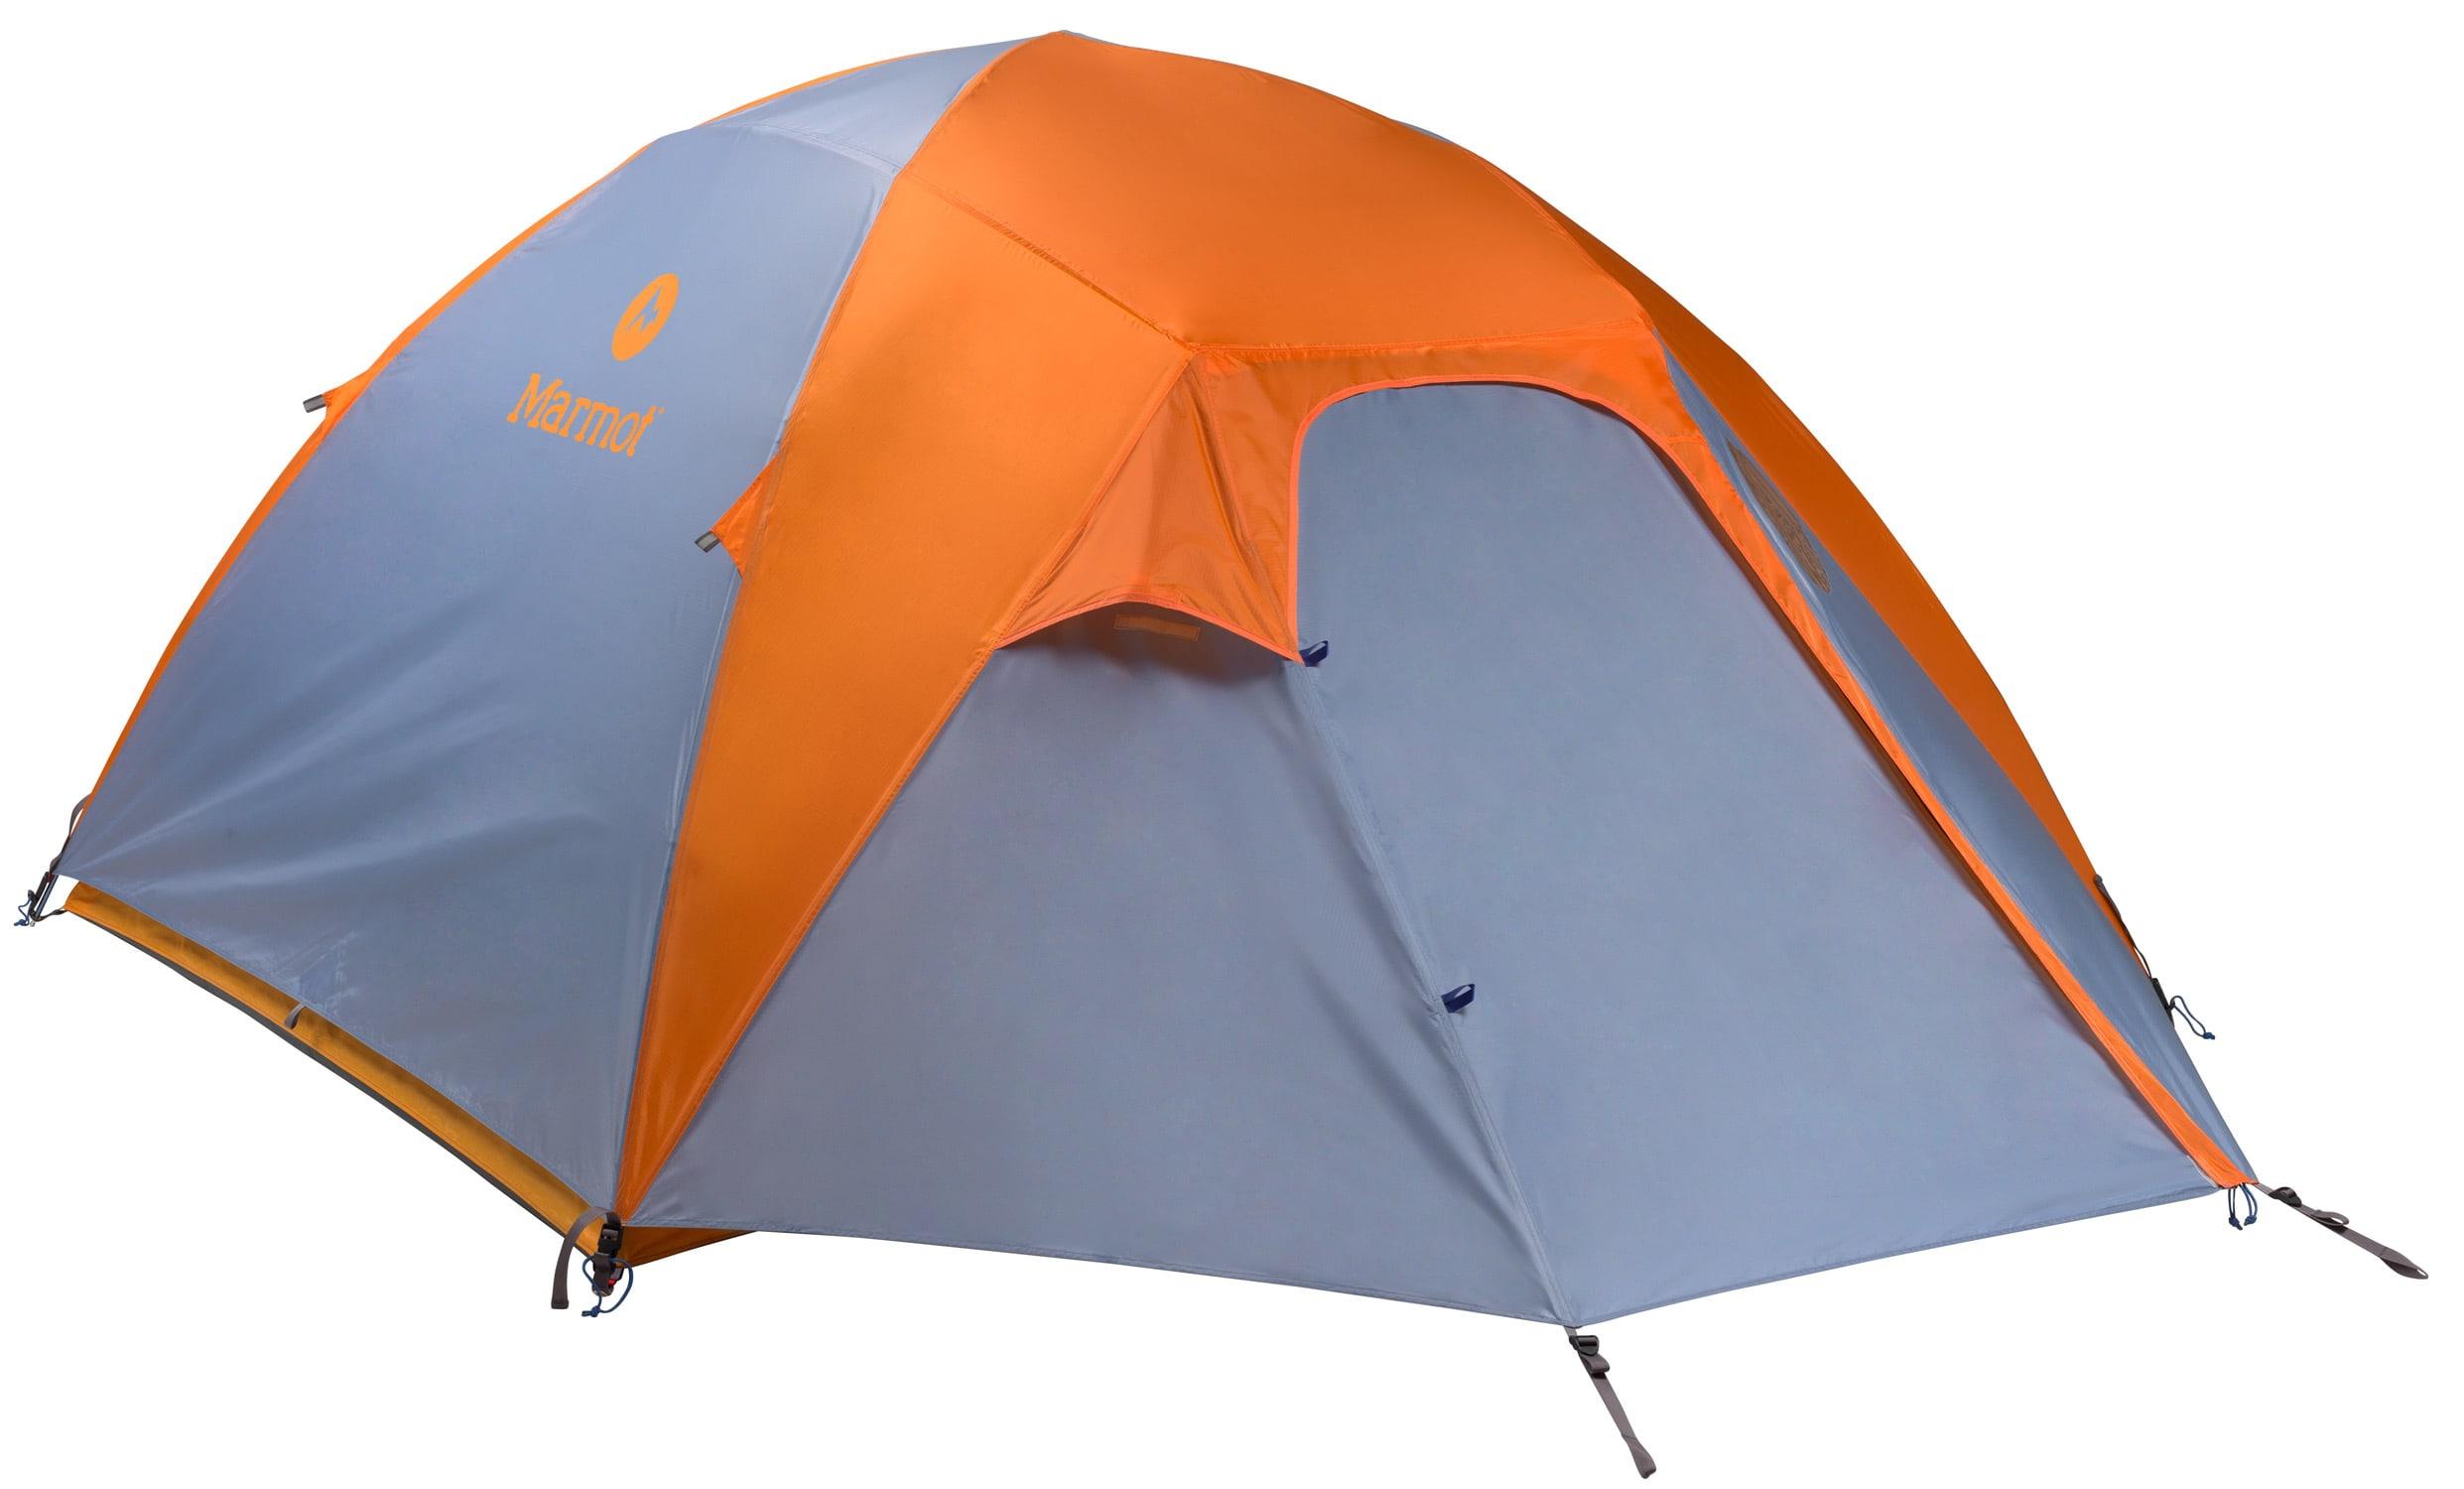 Marmot Limelight 4 Person Tent - thumbnail 2  sc 1 st  The House & On Sale Marmot Limelight 4 Person Tent up to 50% off